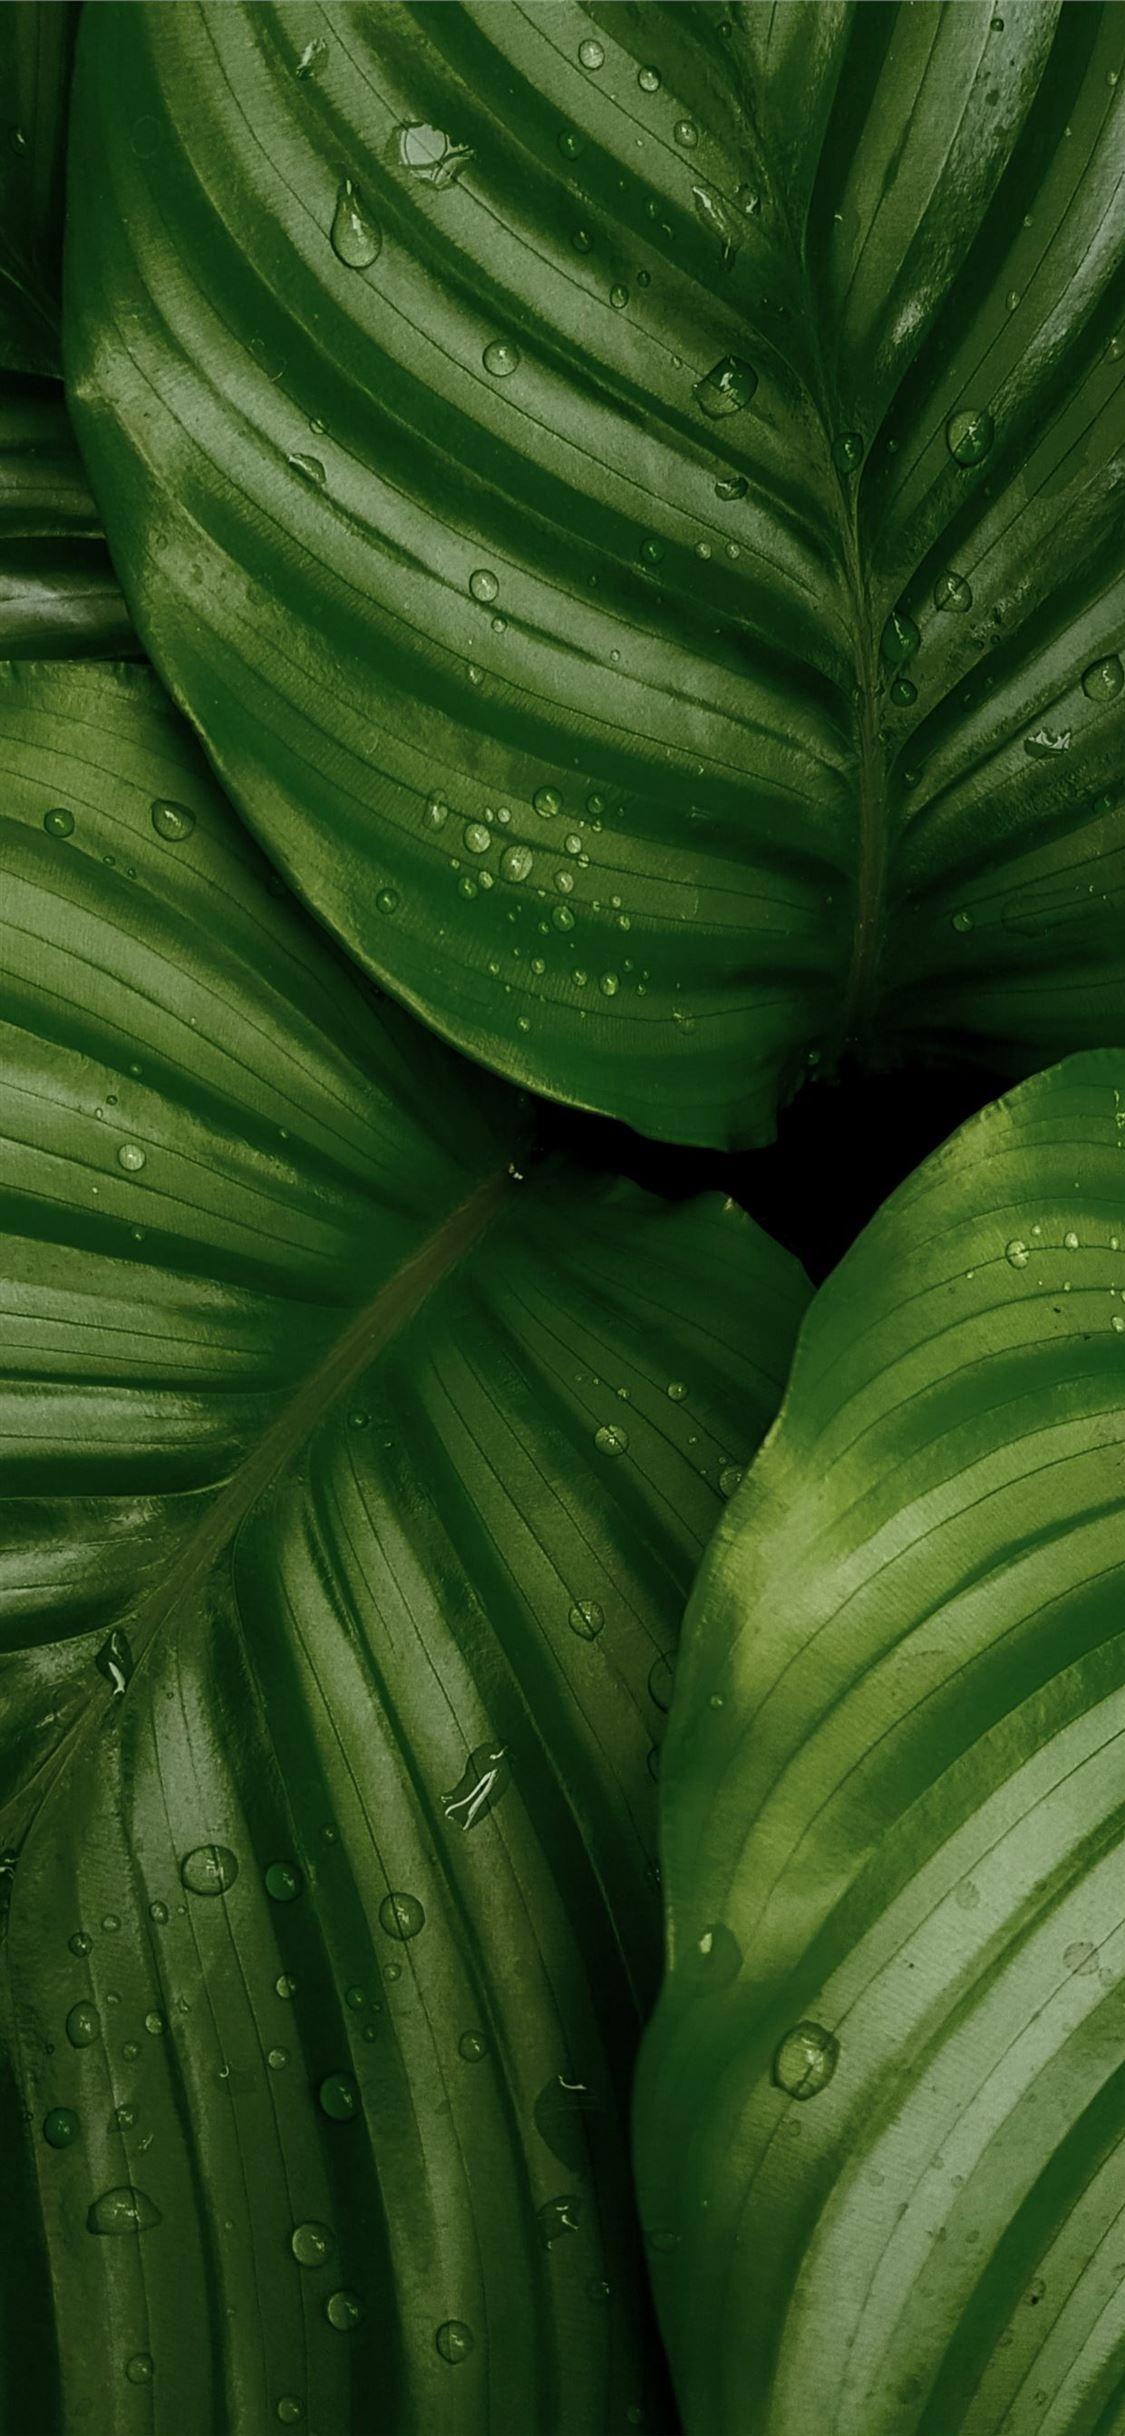 Water Droplets On Green Leaves Leaf Food Nature Iphonexwallpaper Green Nature Wallpaper Green Leaf Wallpaper Dark Green Aesthetic